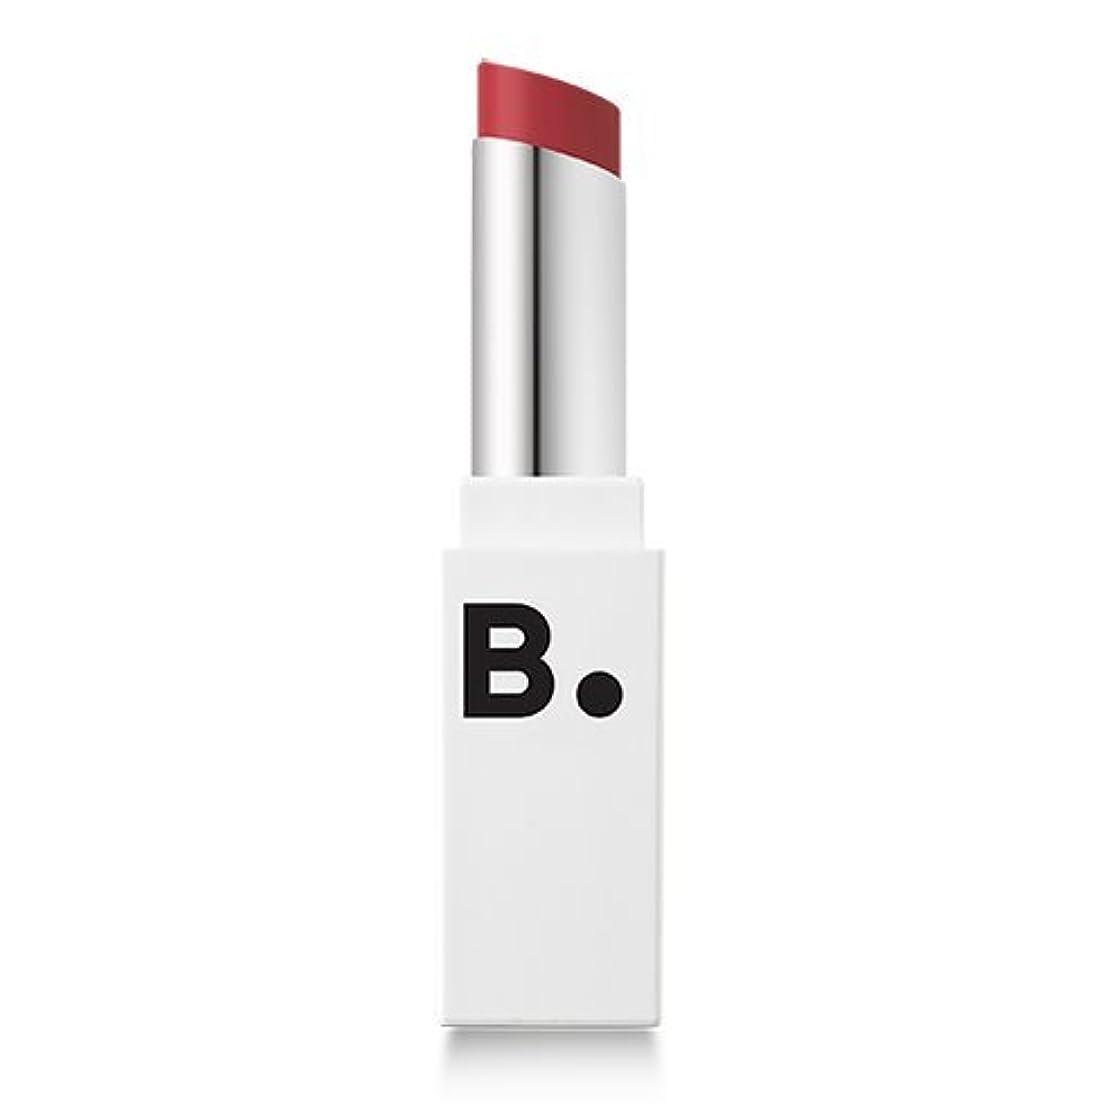 BANILA CO Lip Draw Matte Blast Stick 4.2g/バニラコ リップ ドロー マット ブラスト スティック 4.2g (#MPK02) [並行輸入品]